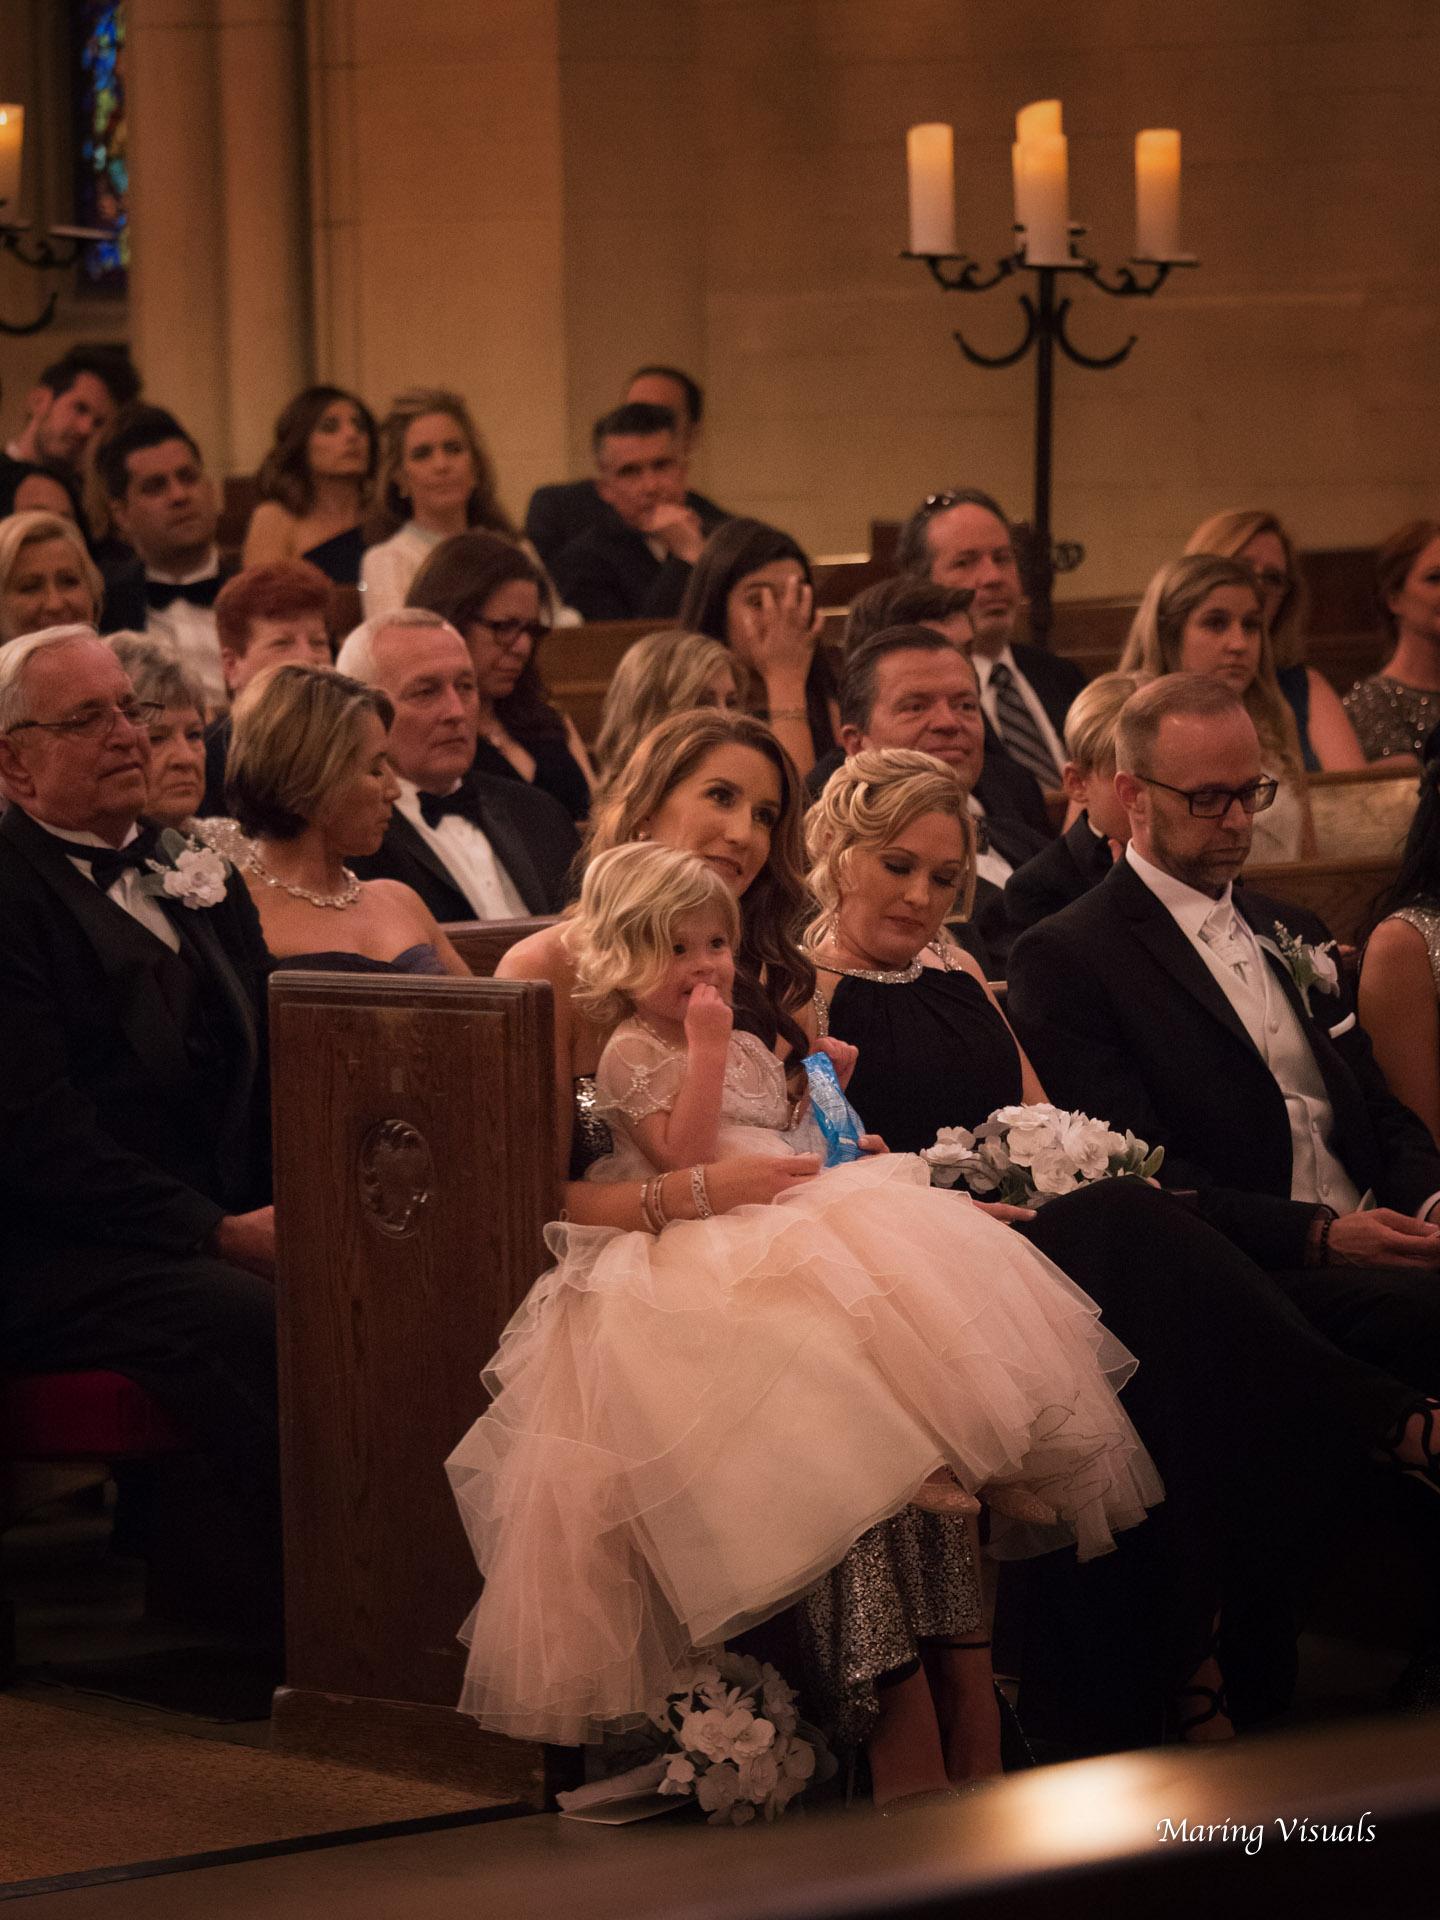 David Tutera Weddings by Maring Visuals 00521.jpg